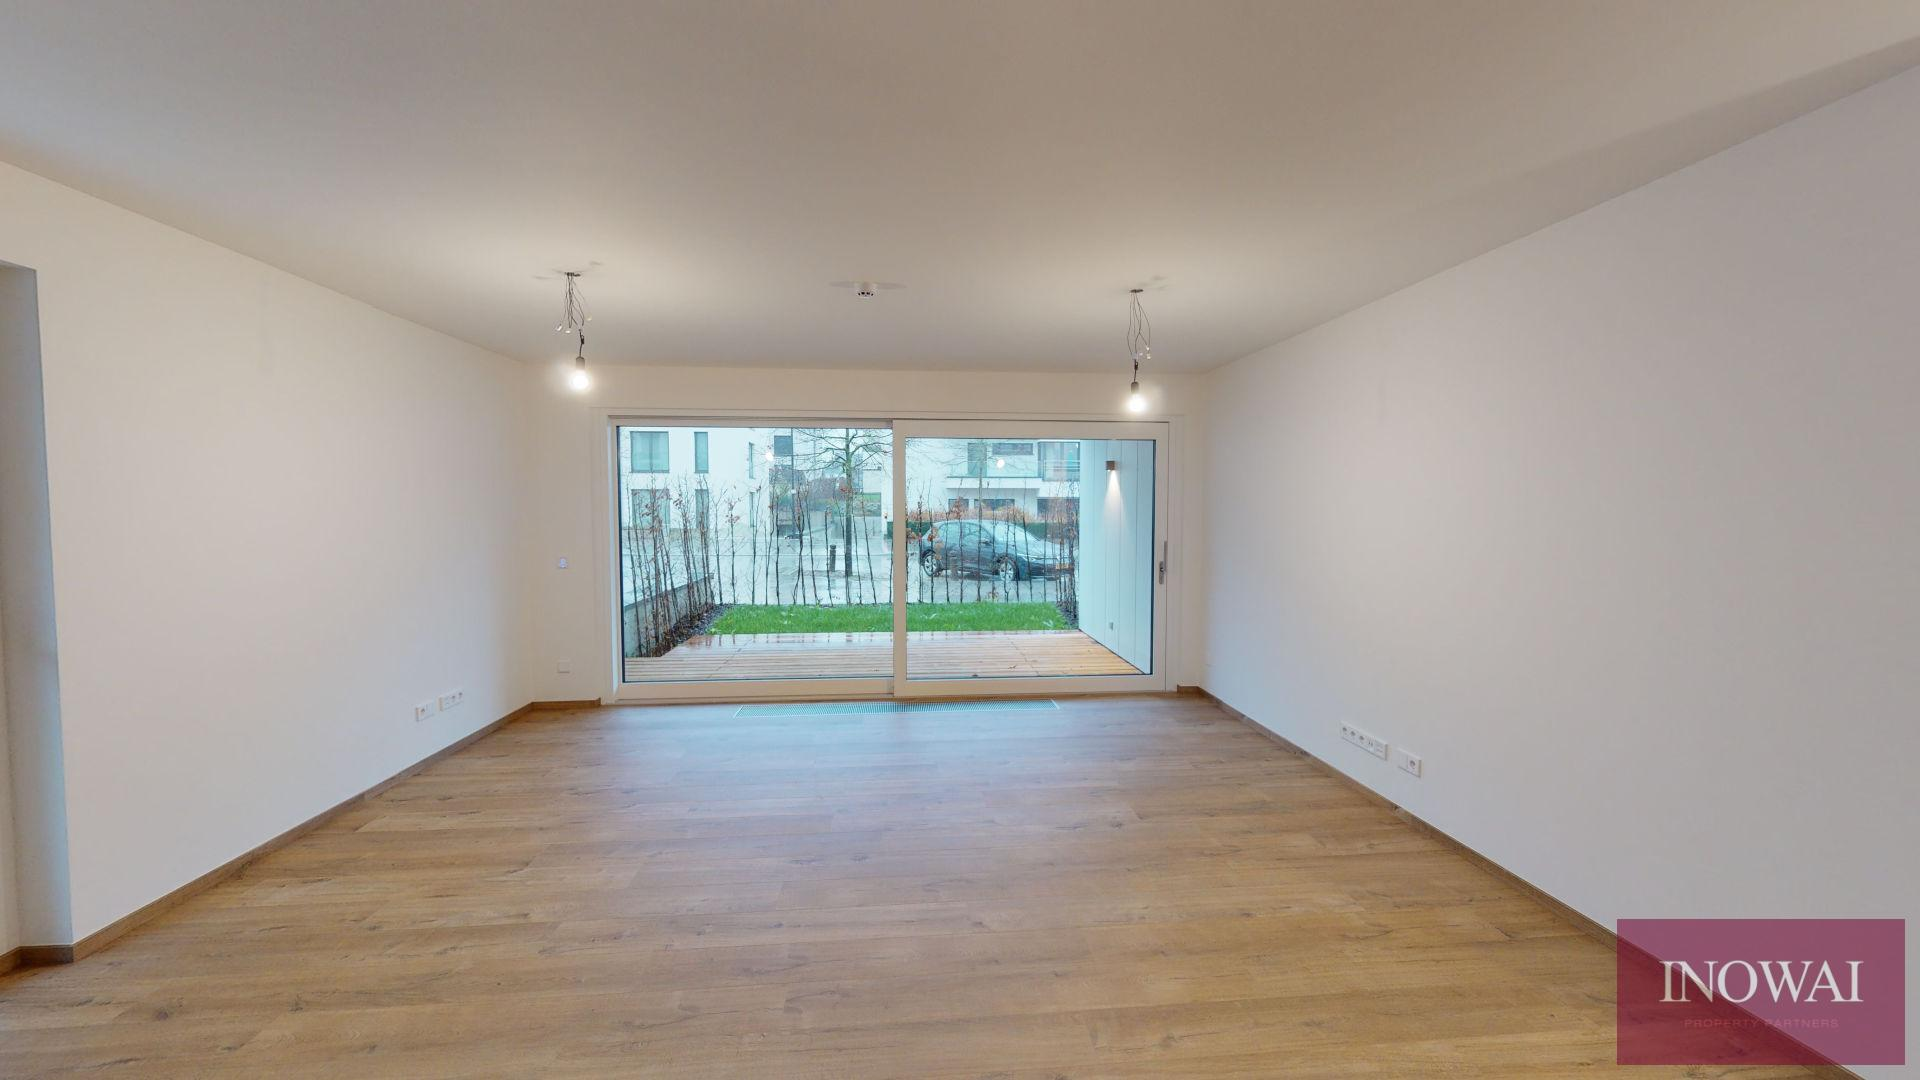 Appartement 2 chambres avec Jardin